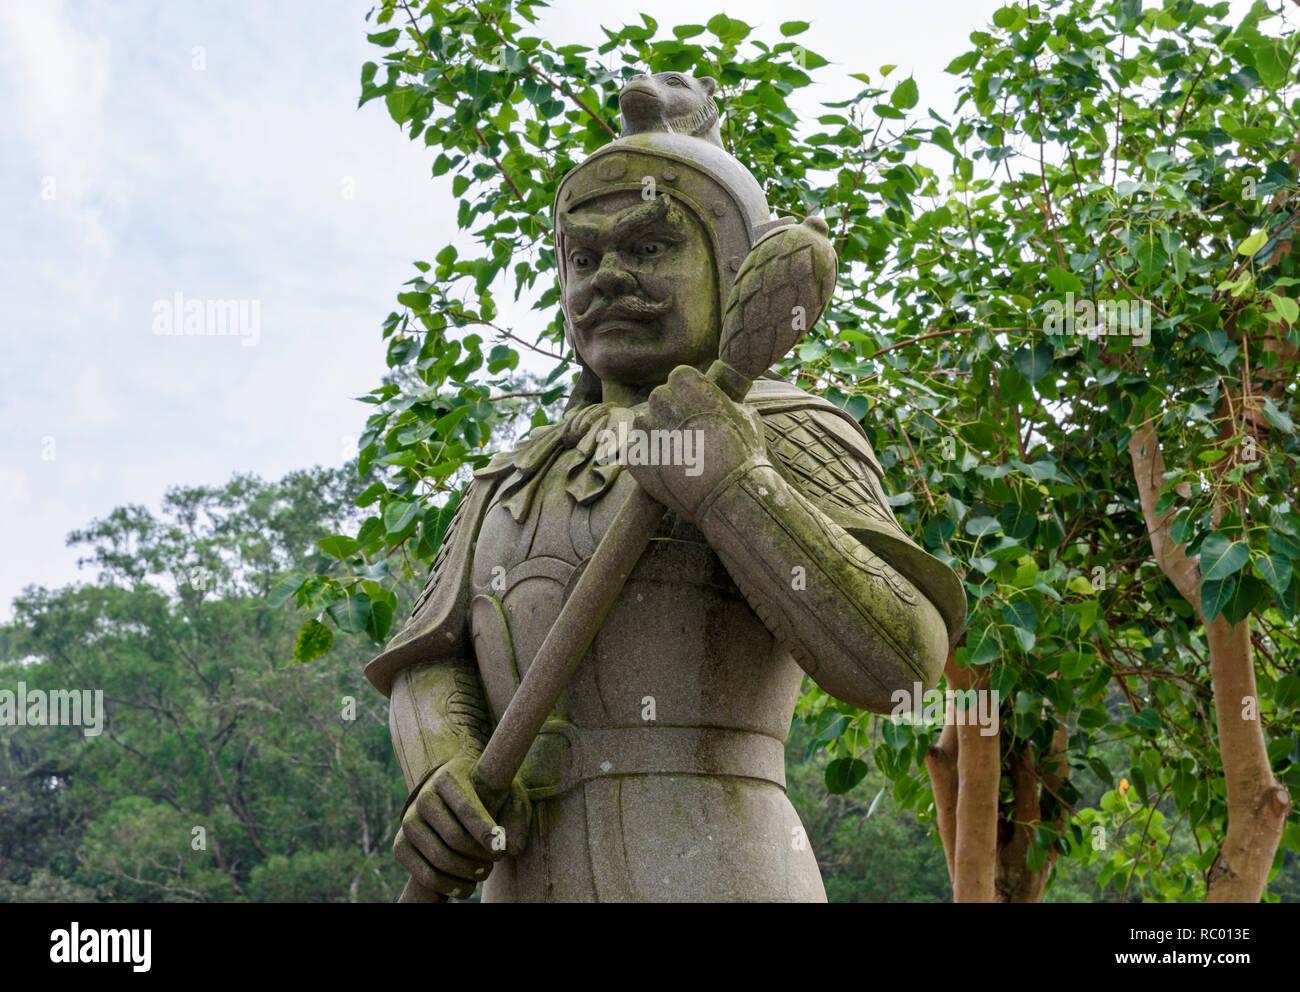 One of the Twelve Devine Generals, Andira, in Ngong Ping Piazza, Lantau Island, Hong Kong - Stock Image